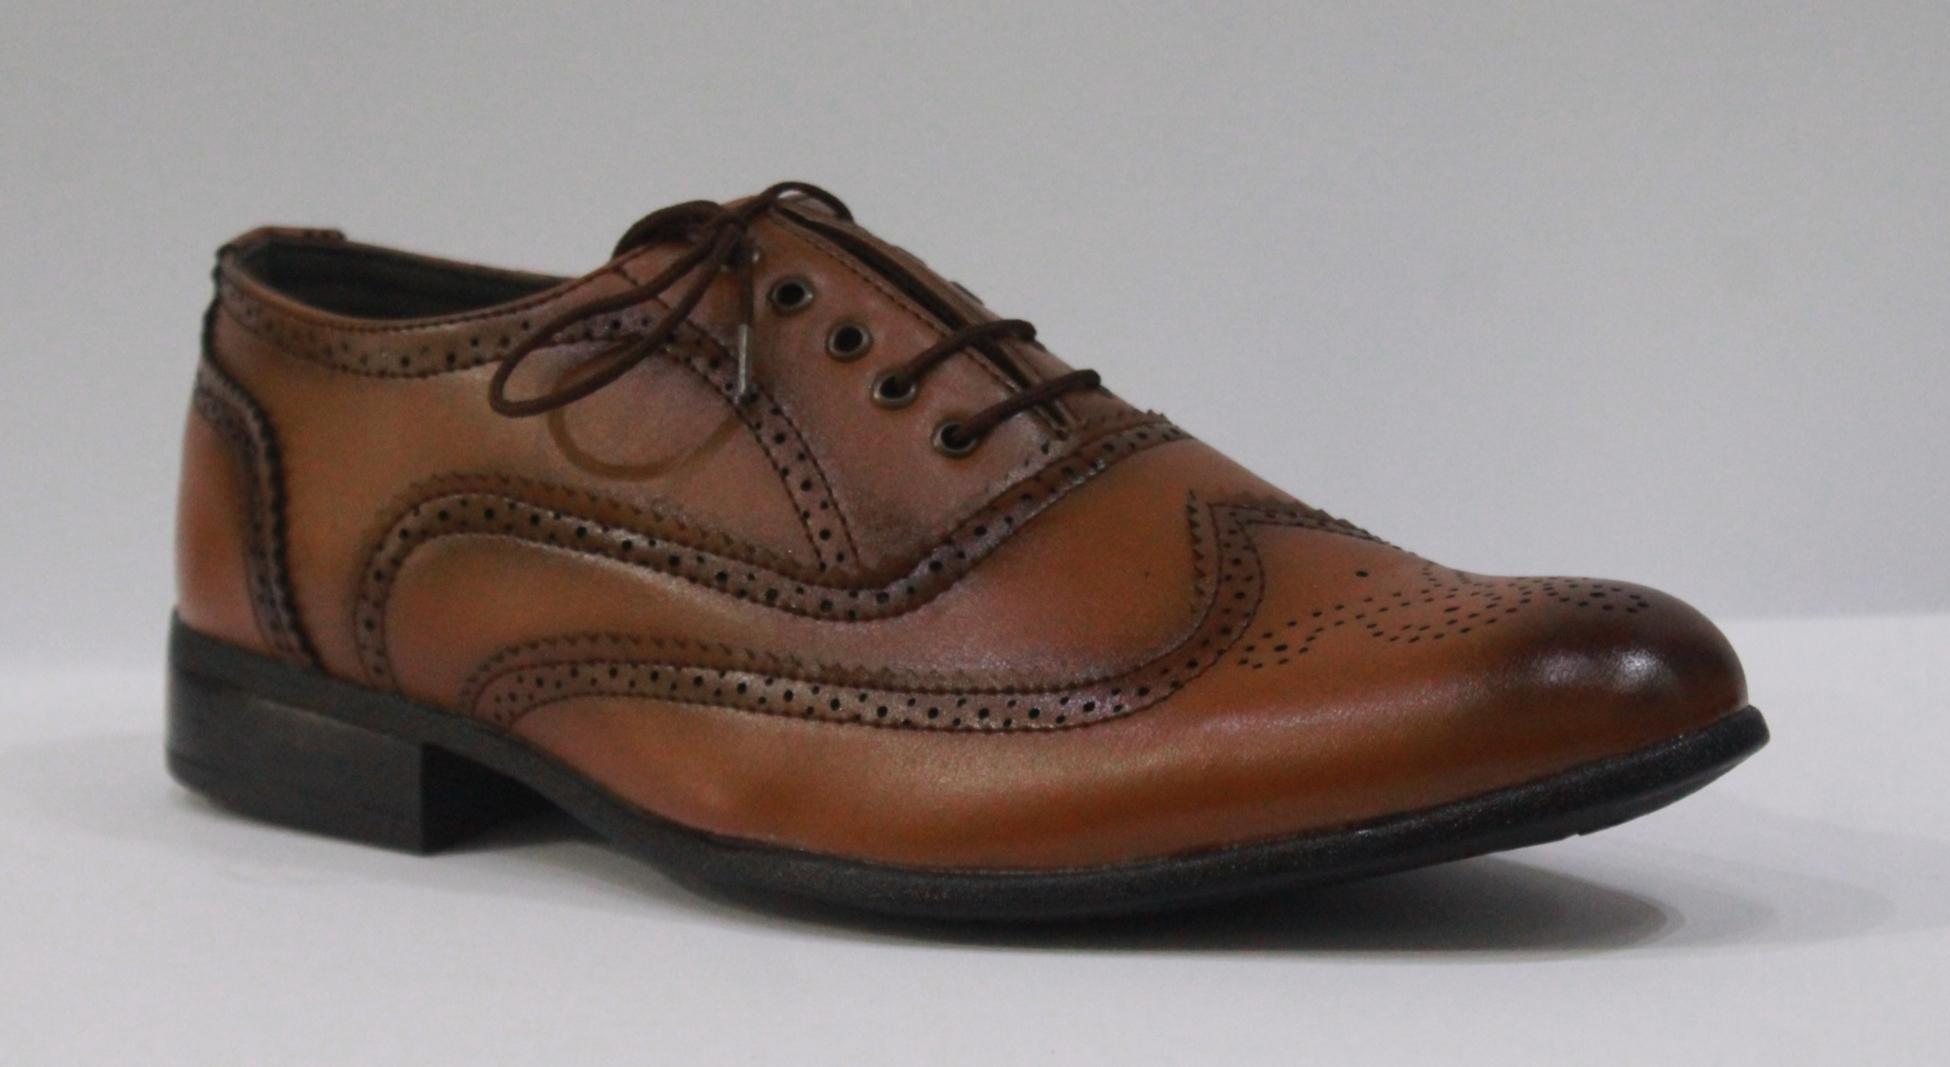 cc245b8c87e Men s Formal Shoes Online in Pakistan - Daraz.pk